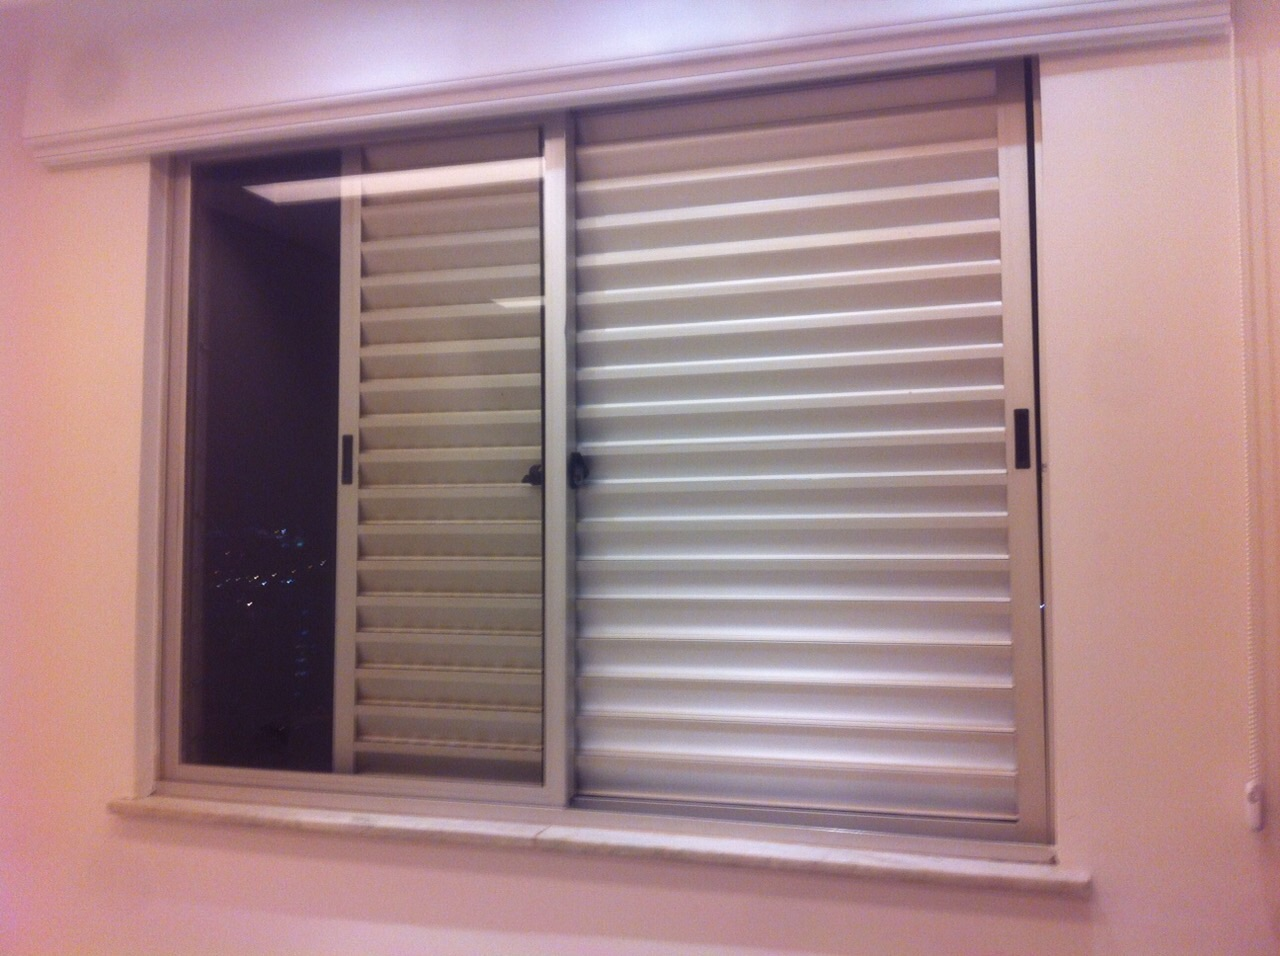 #904C3B janela de correr com veneziana janela veneziana acessório para janela 1672 Janela De Aluminio Manutenção